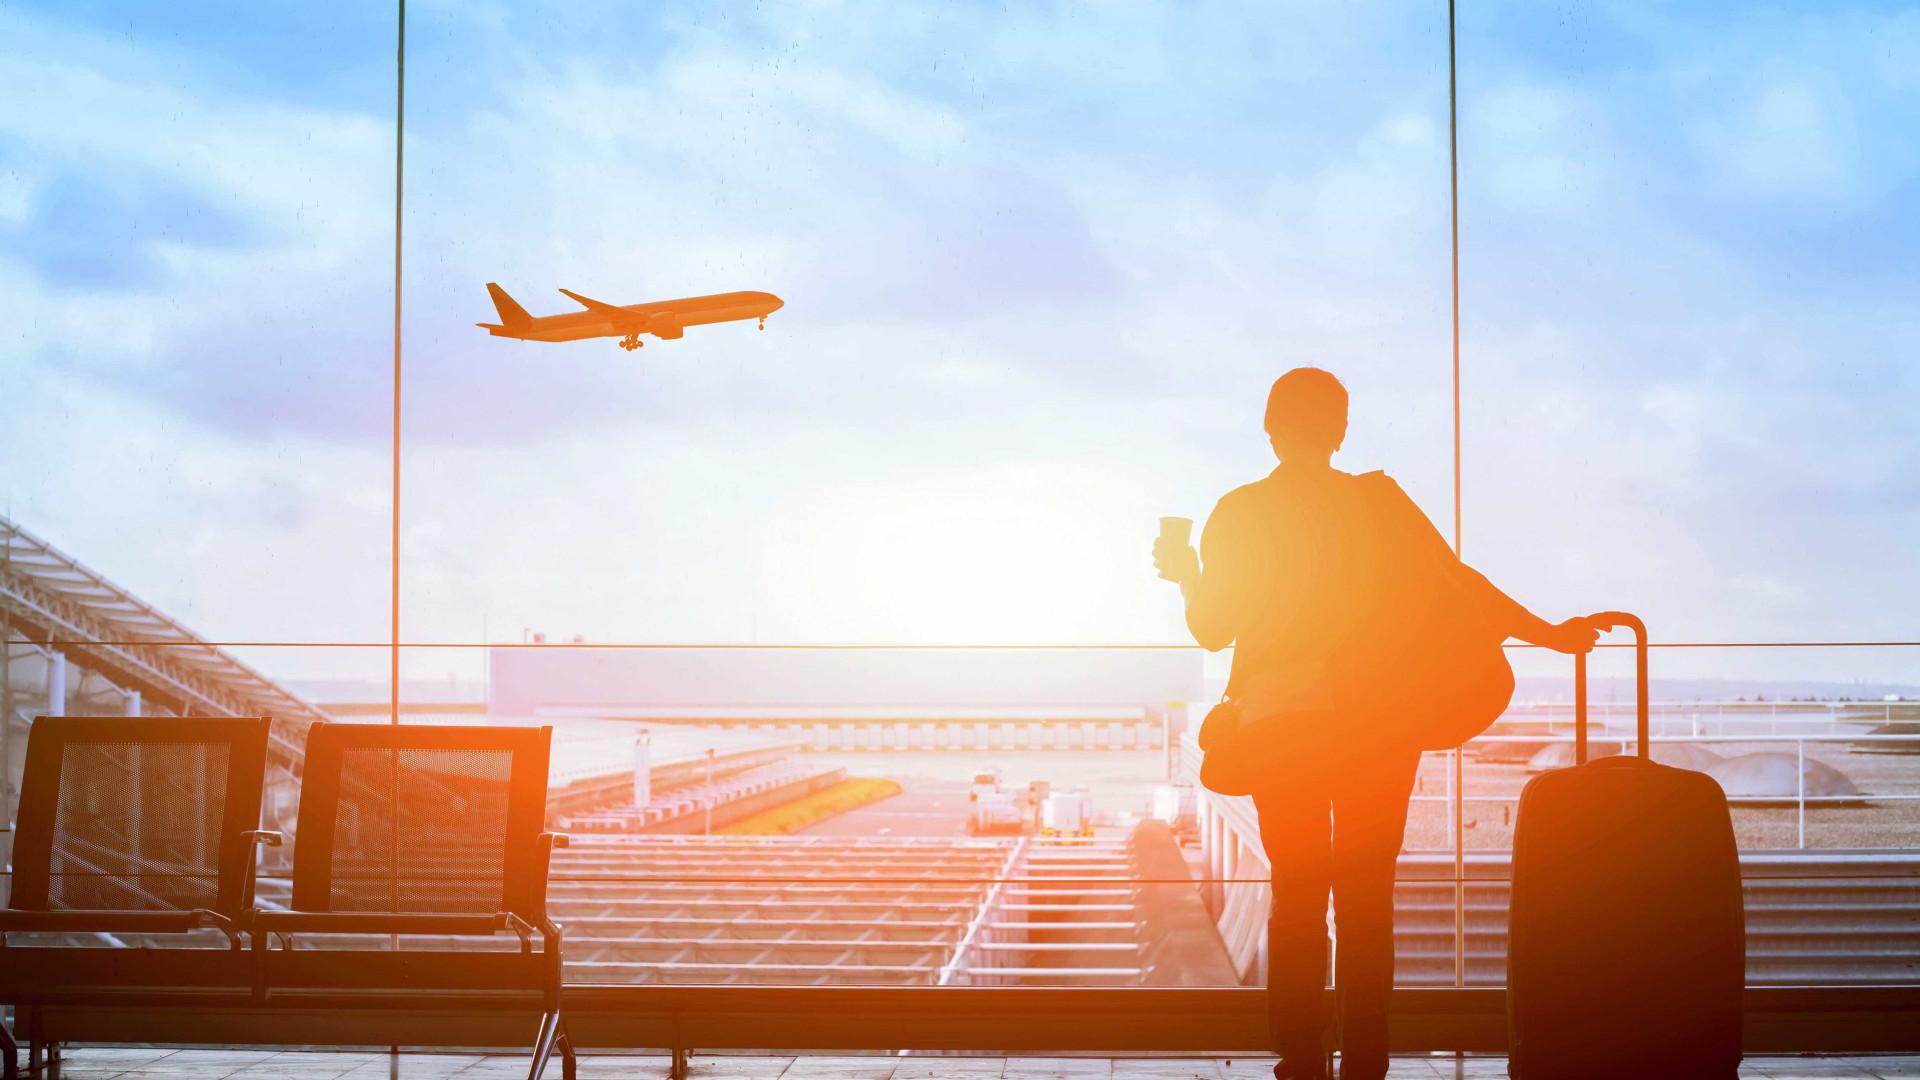 Na Sicília, pai abandonou menor no aeroporto...e foi de férias